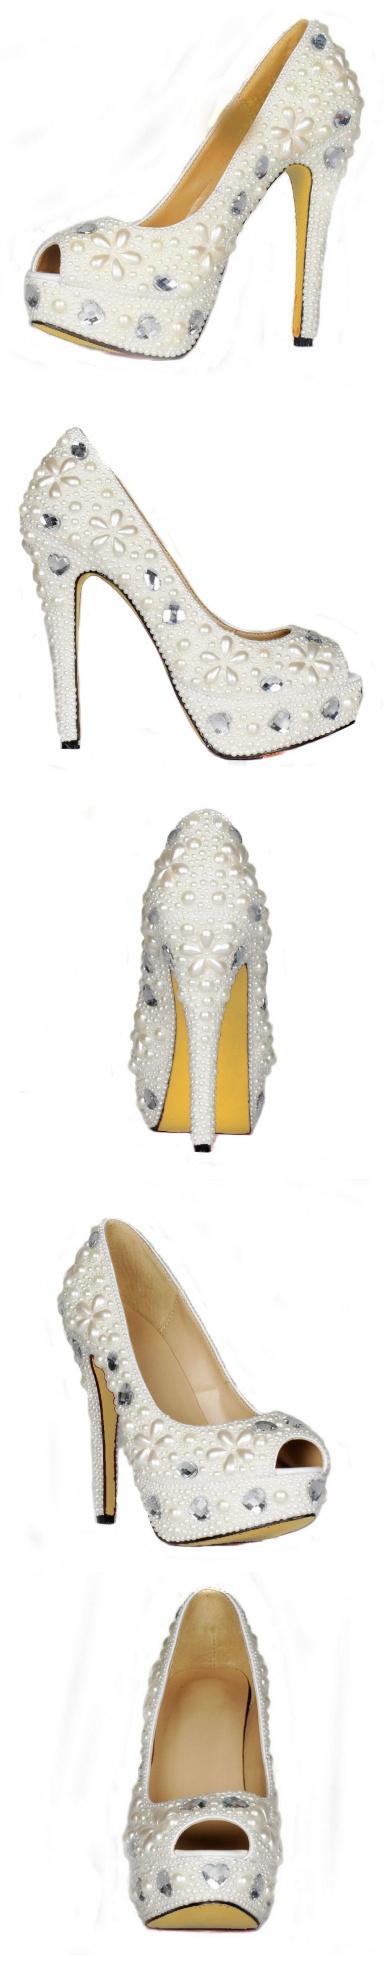 Yellow Metal Review Feet High Heels Matures Animal Adorable Weddings High Heel…